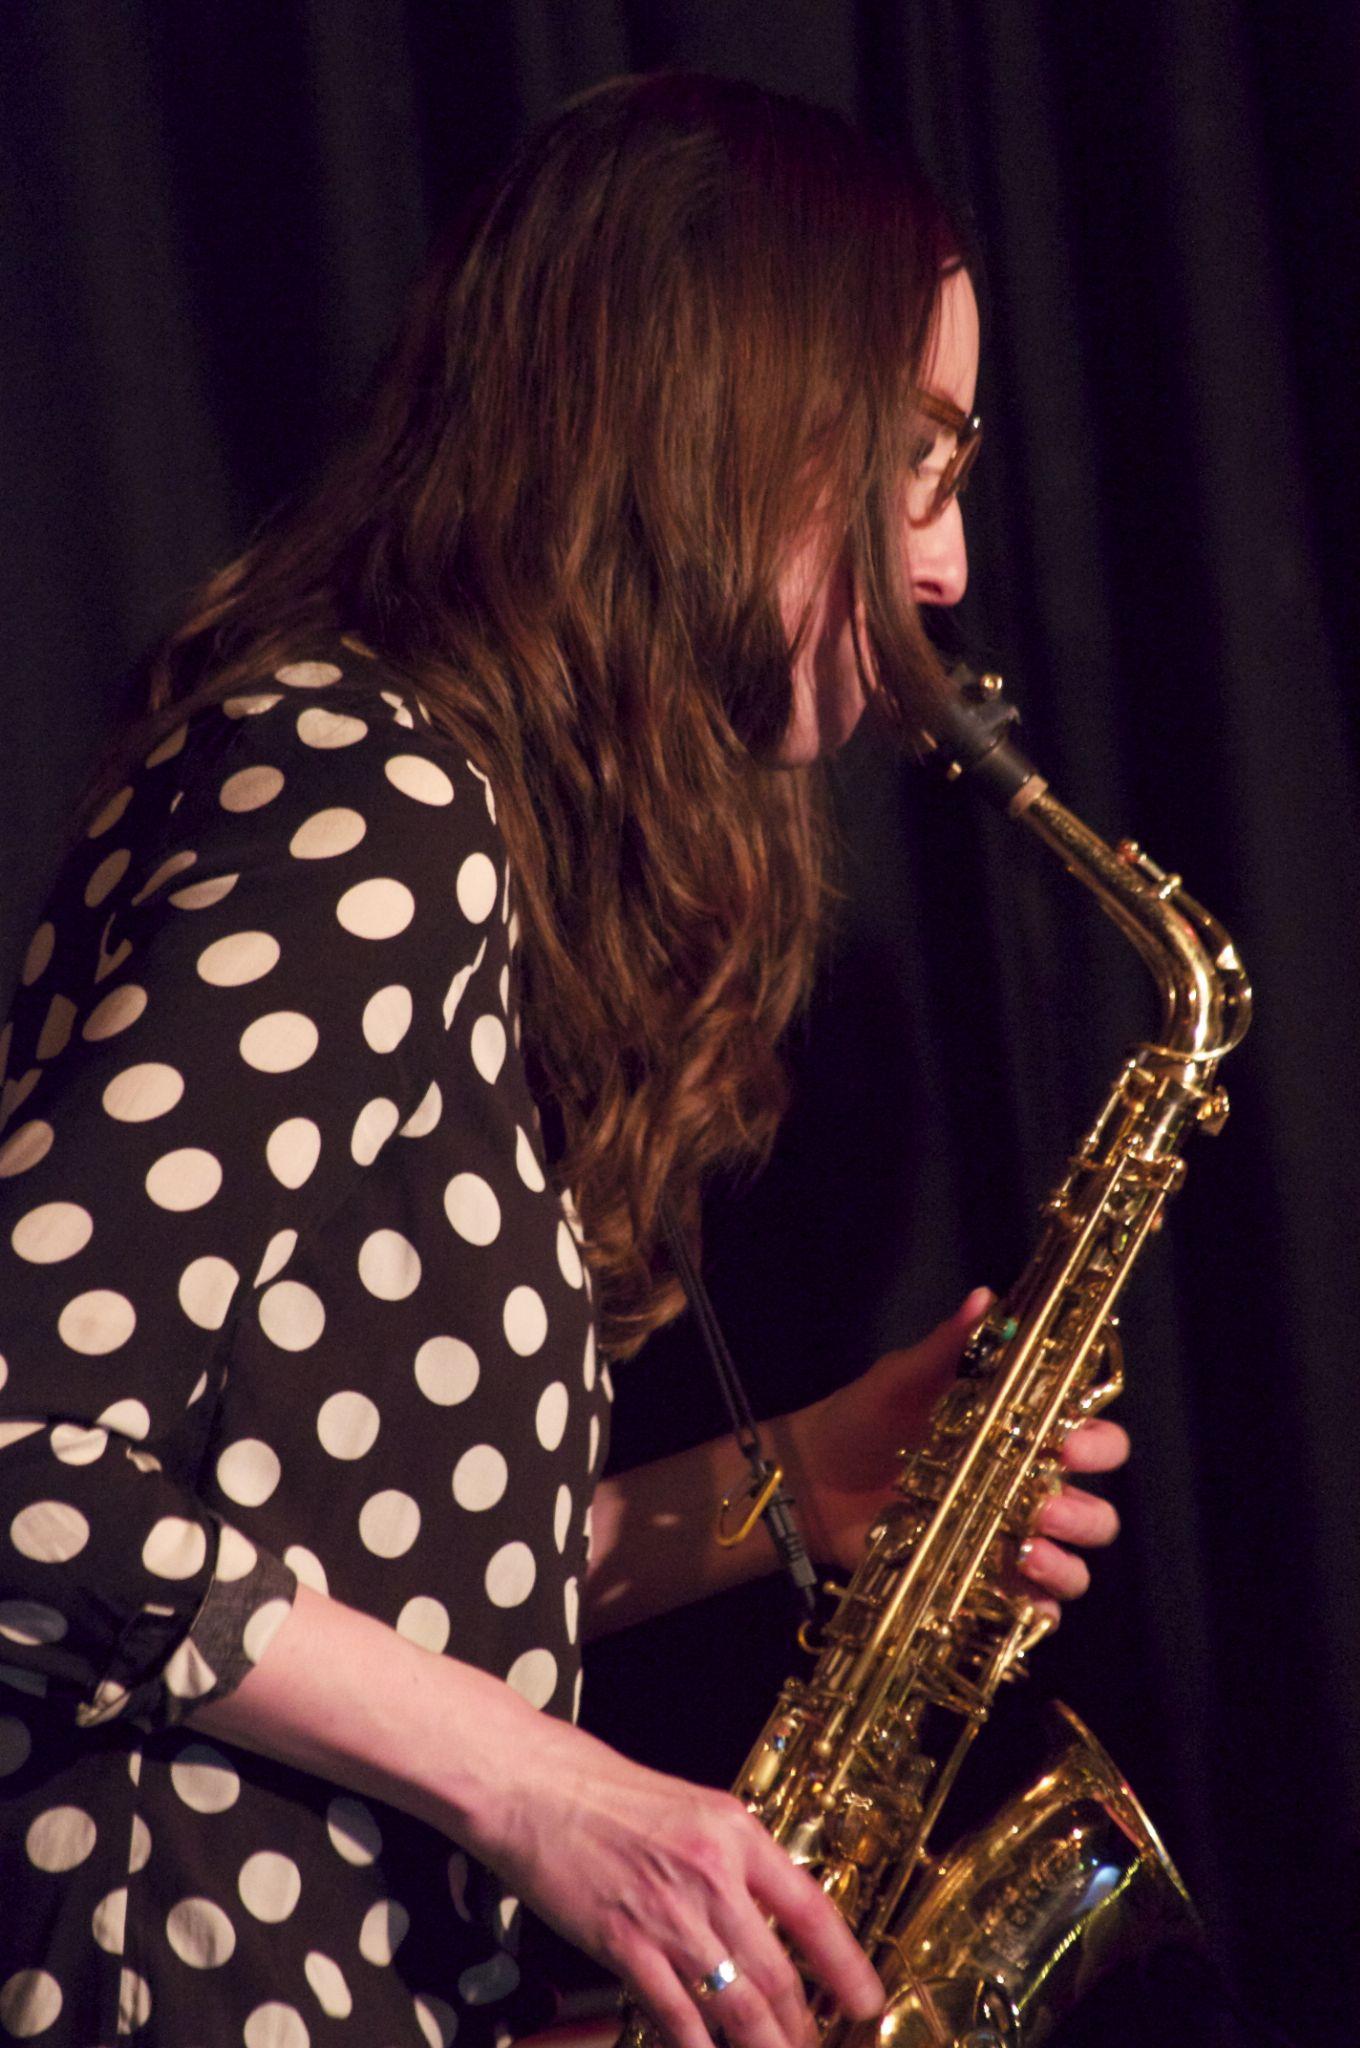 saxophonist  by tom salt